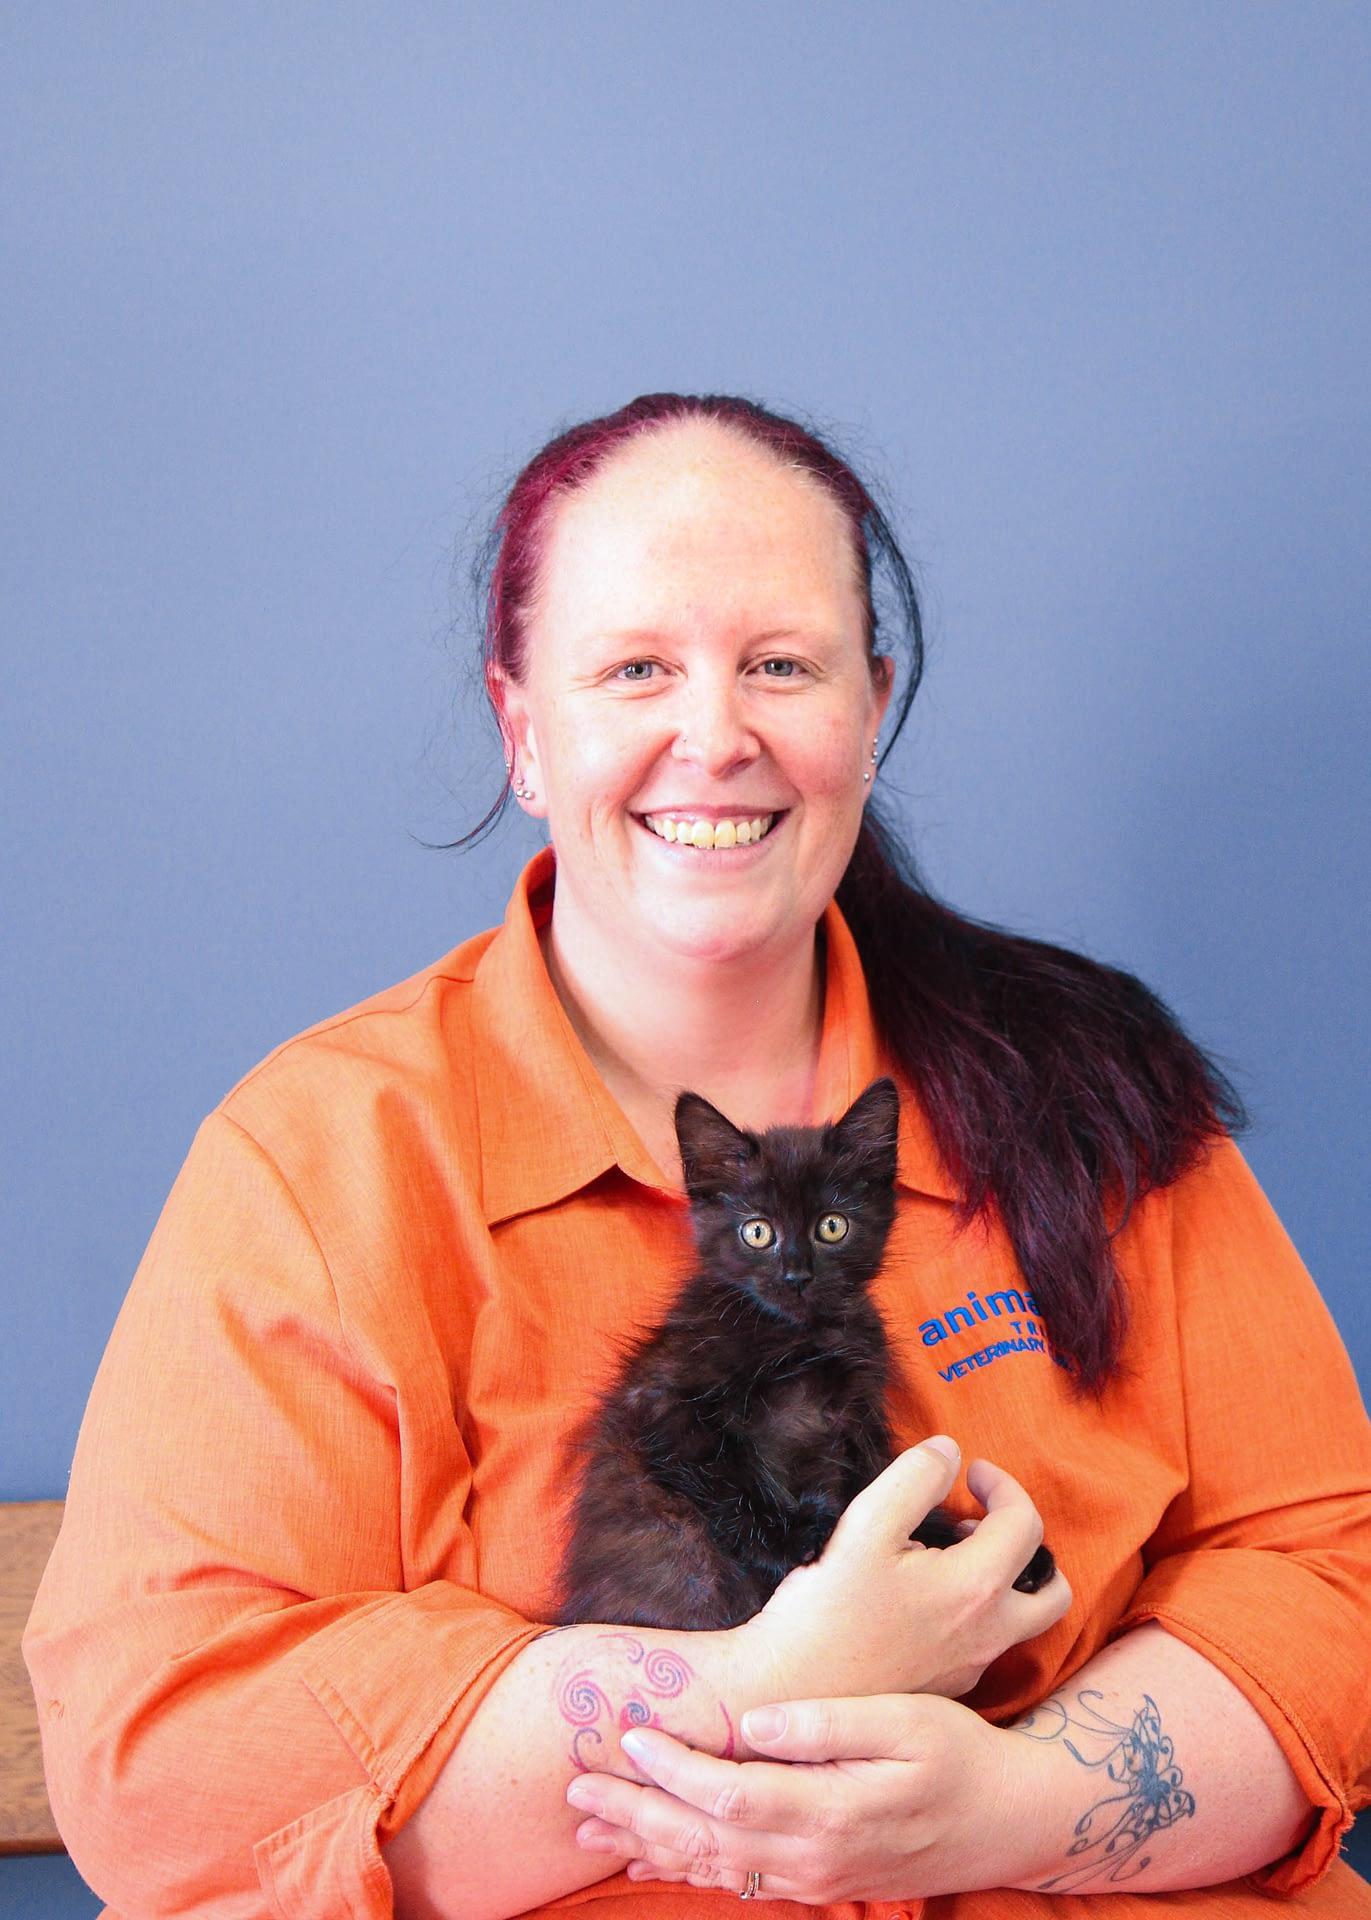 Animal Tracks Vet Nurse Nicole with a fluffy black kitten